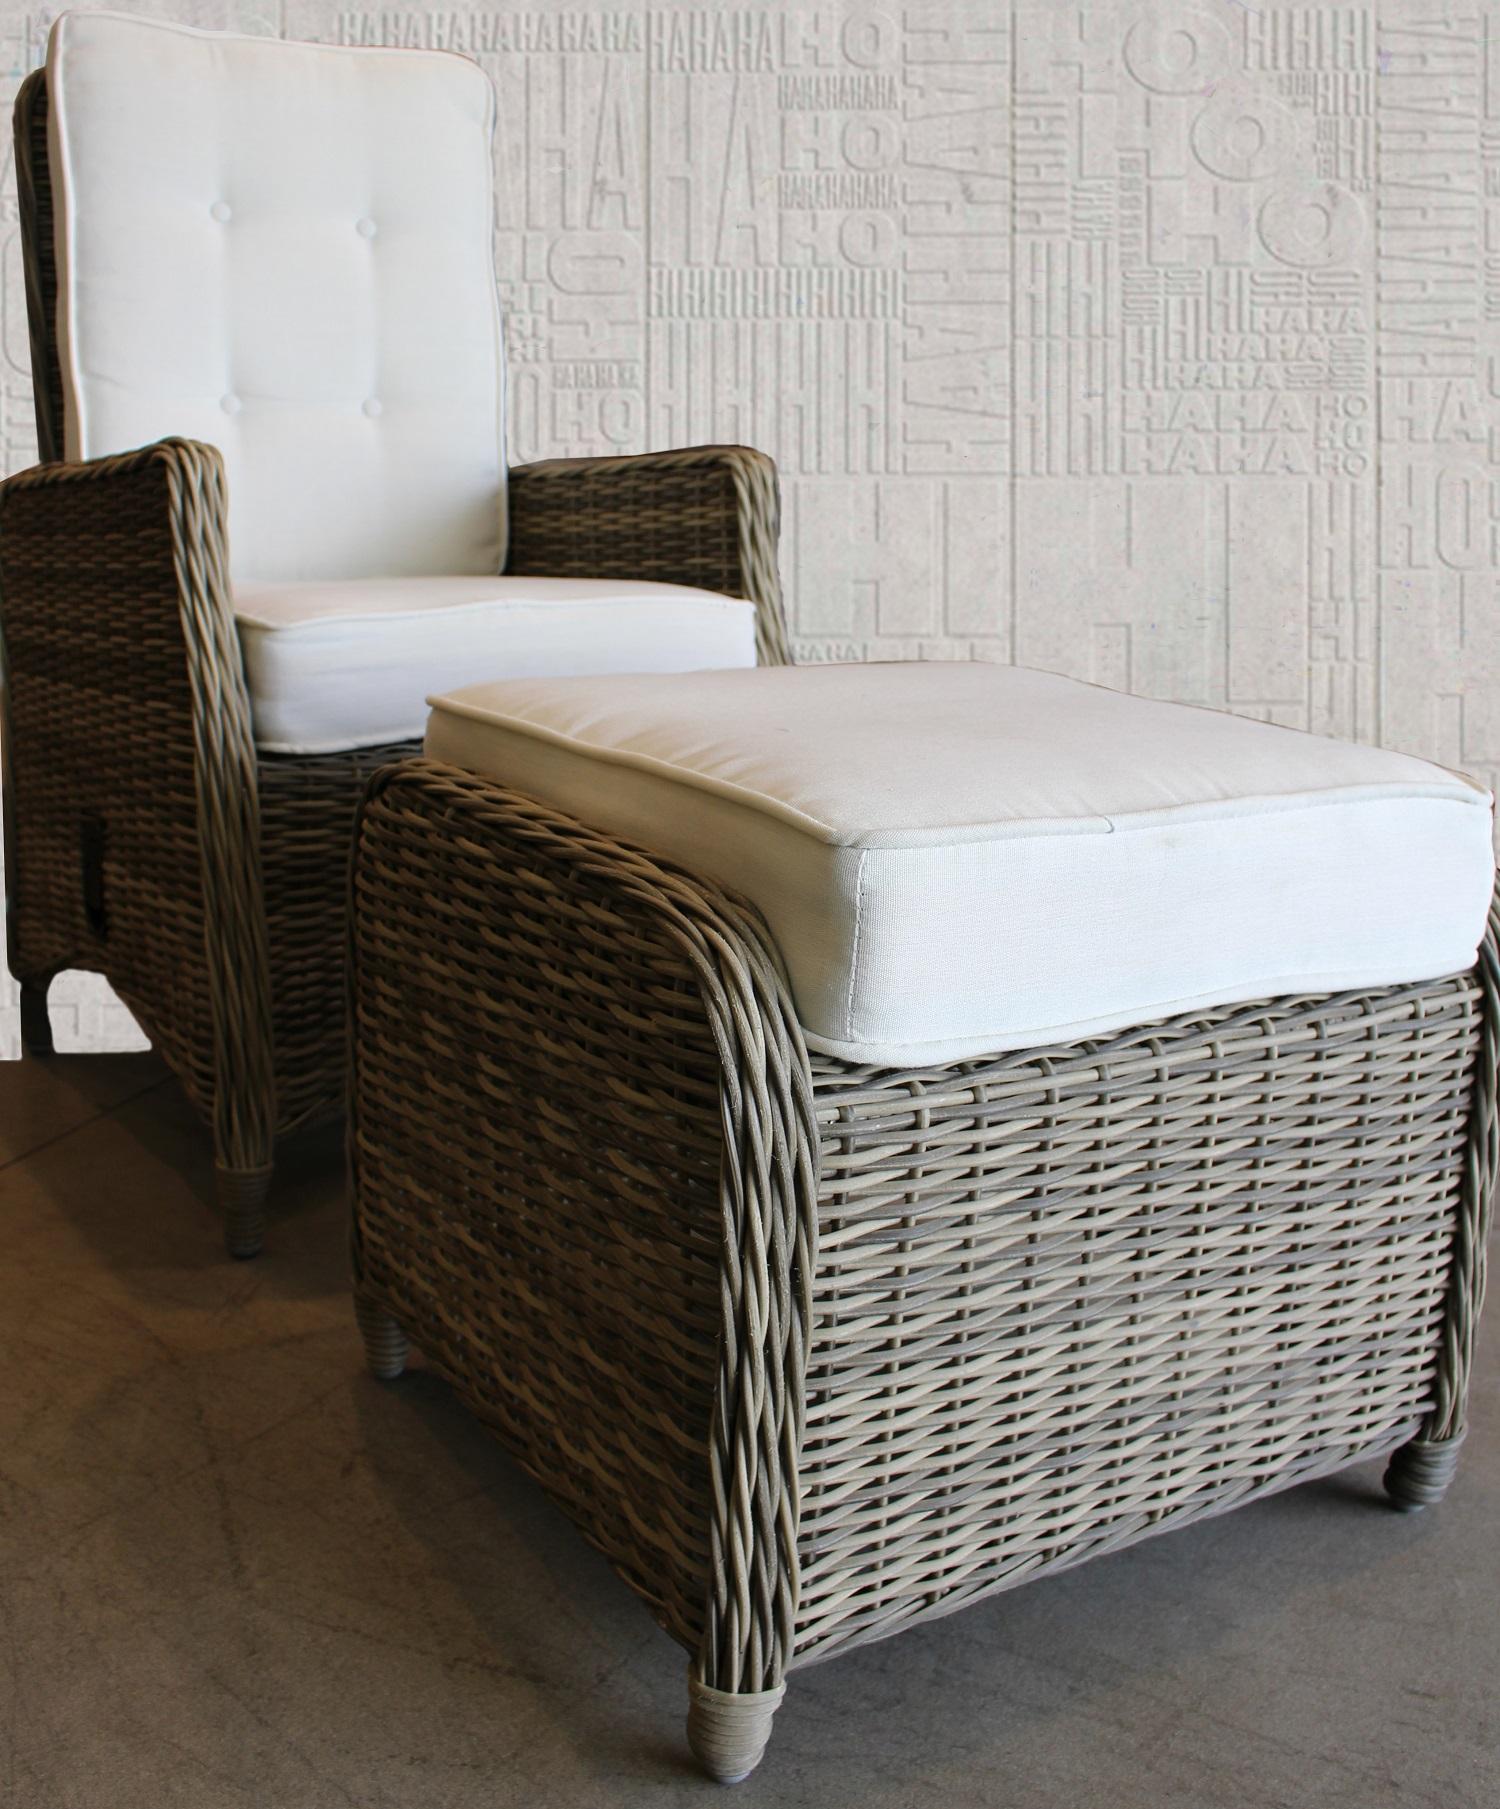 Fauteuil en fibre synth tique avec reposes pieds meubles for Deco meuble tunisie